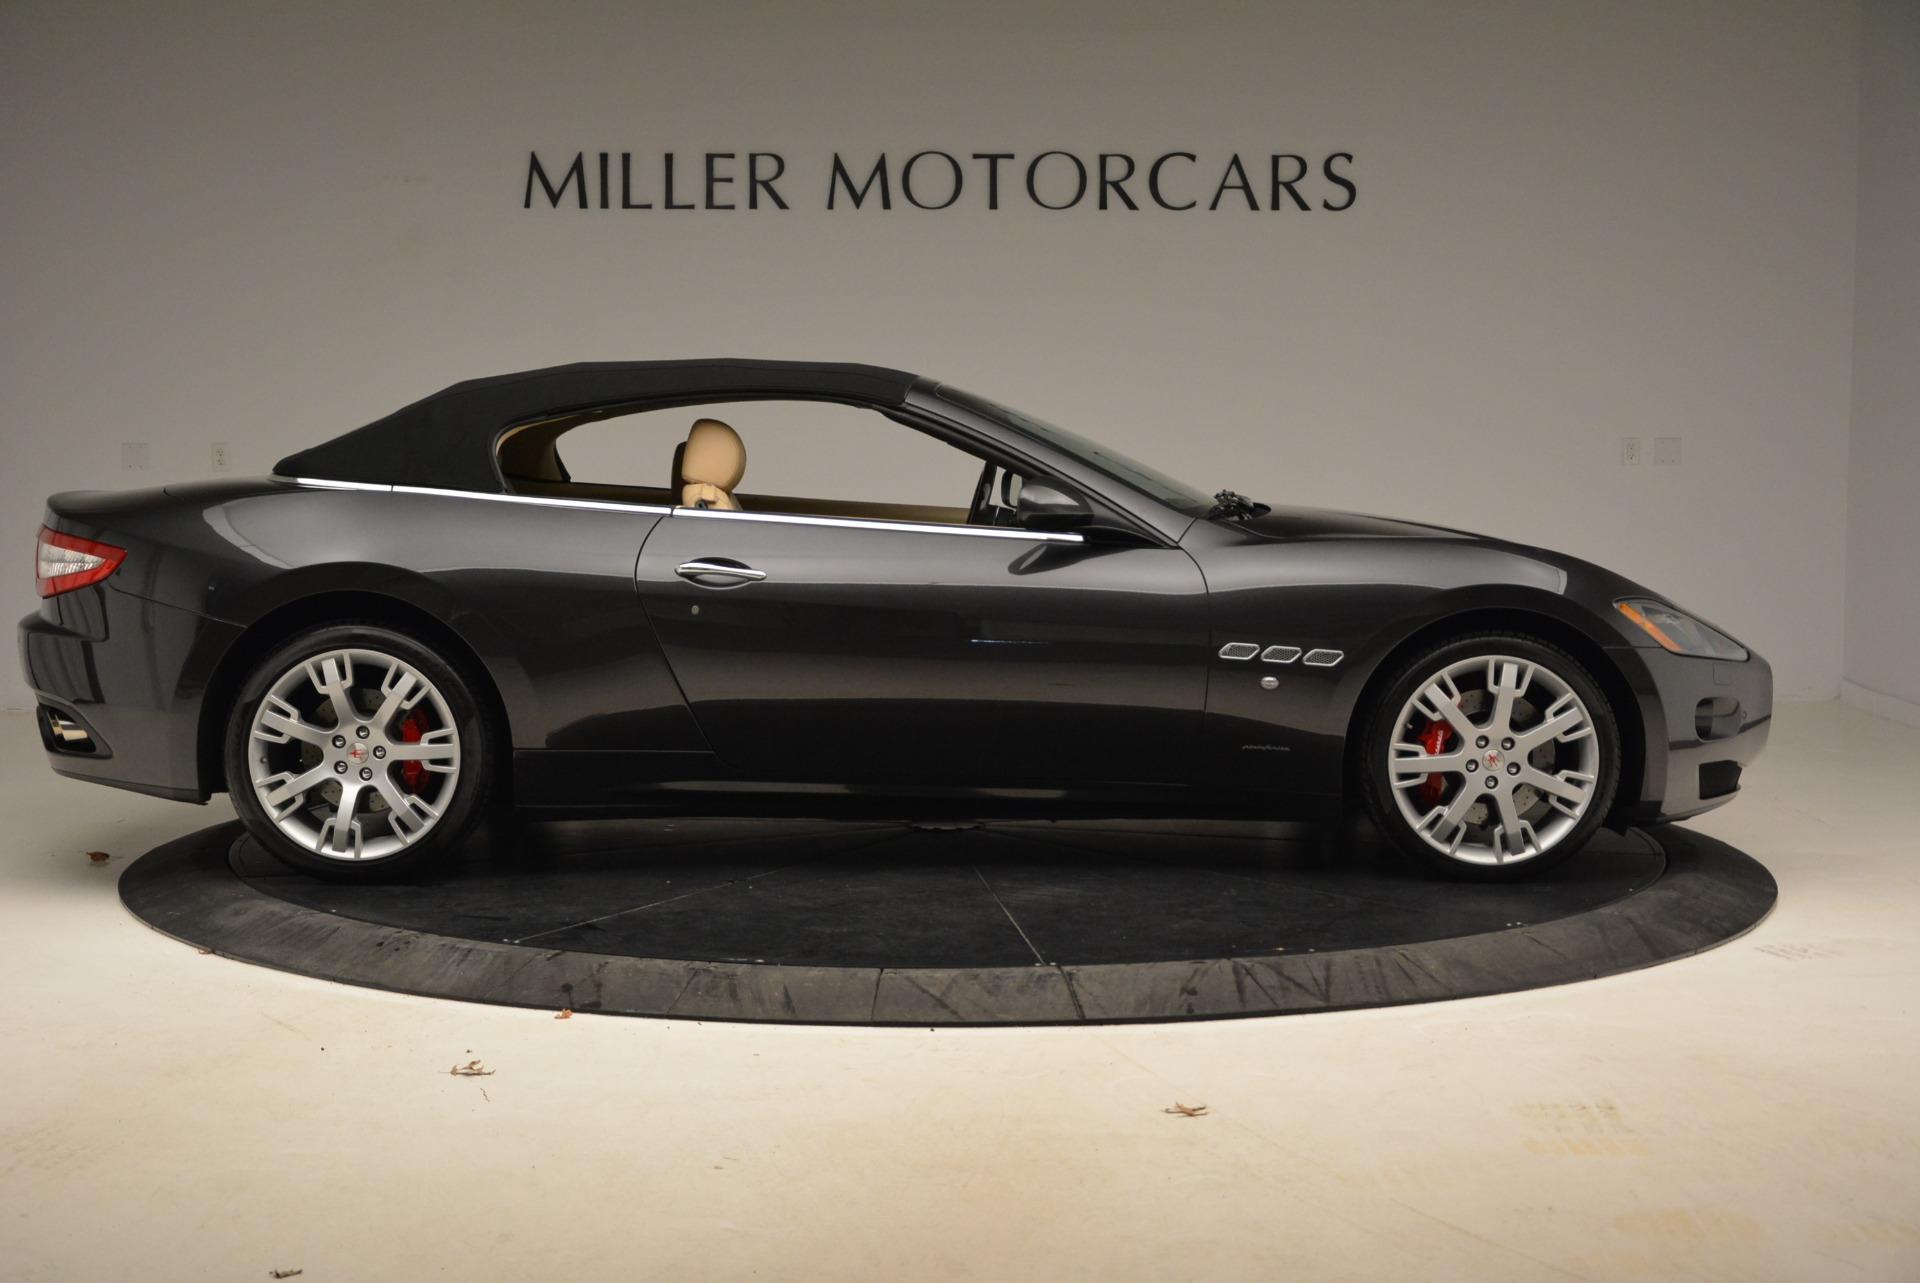 Used 2013 Maserati GranTurismo Convertible  For Sale In Westport, CT 2050_p21